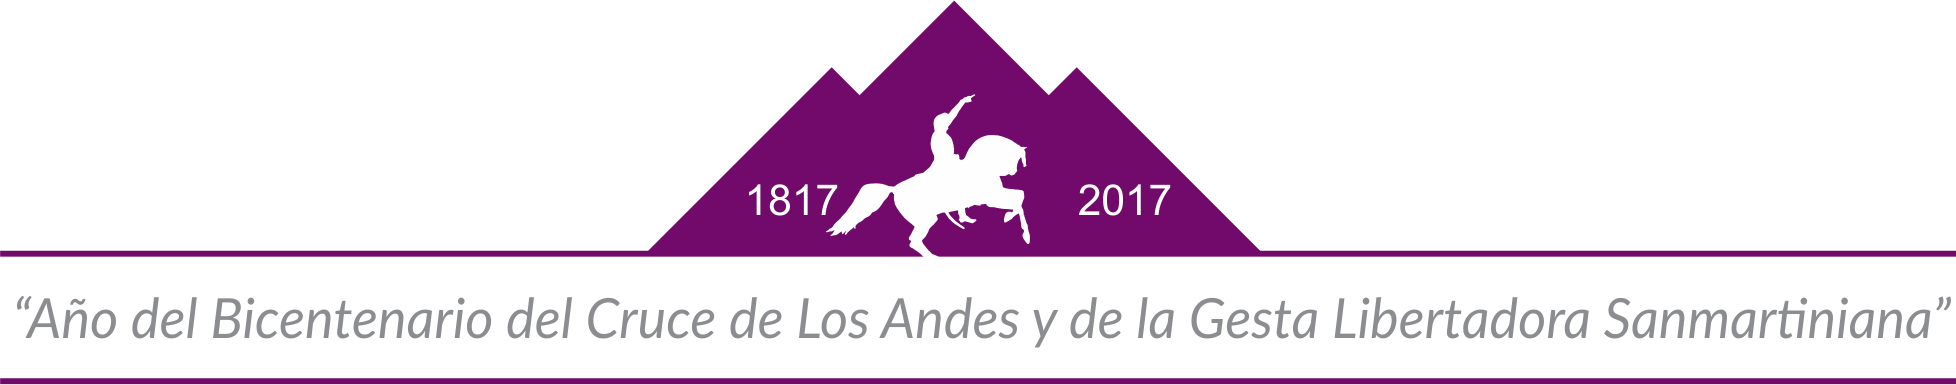 logo gesta_2017